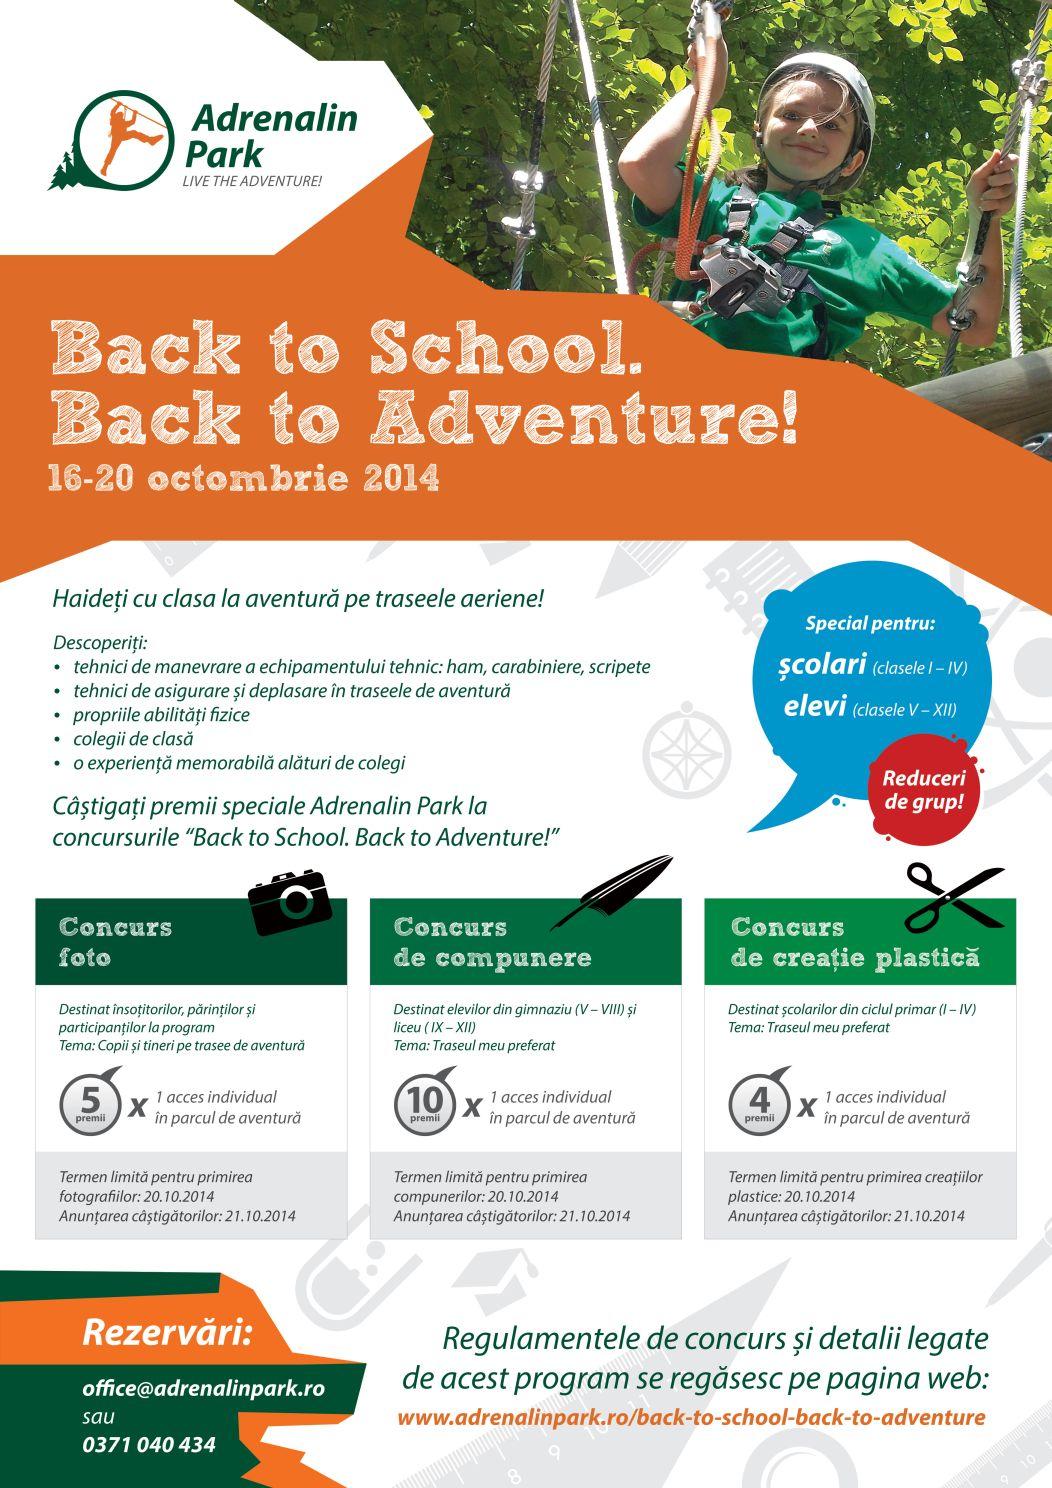 Adrenalin Park activitati par aventura Back-to-school-Back-to-Adventure